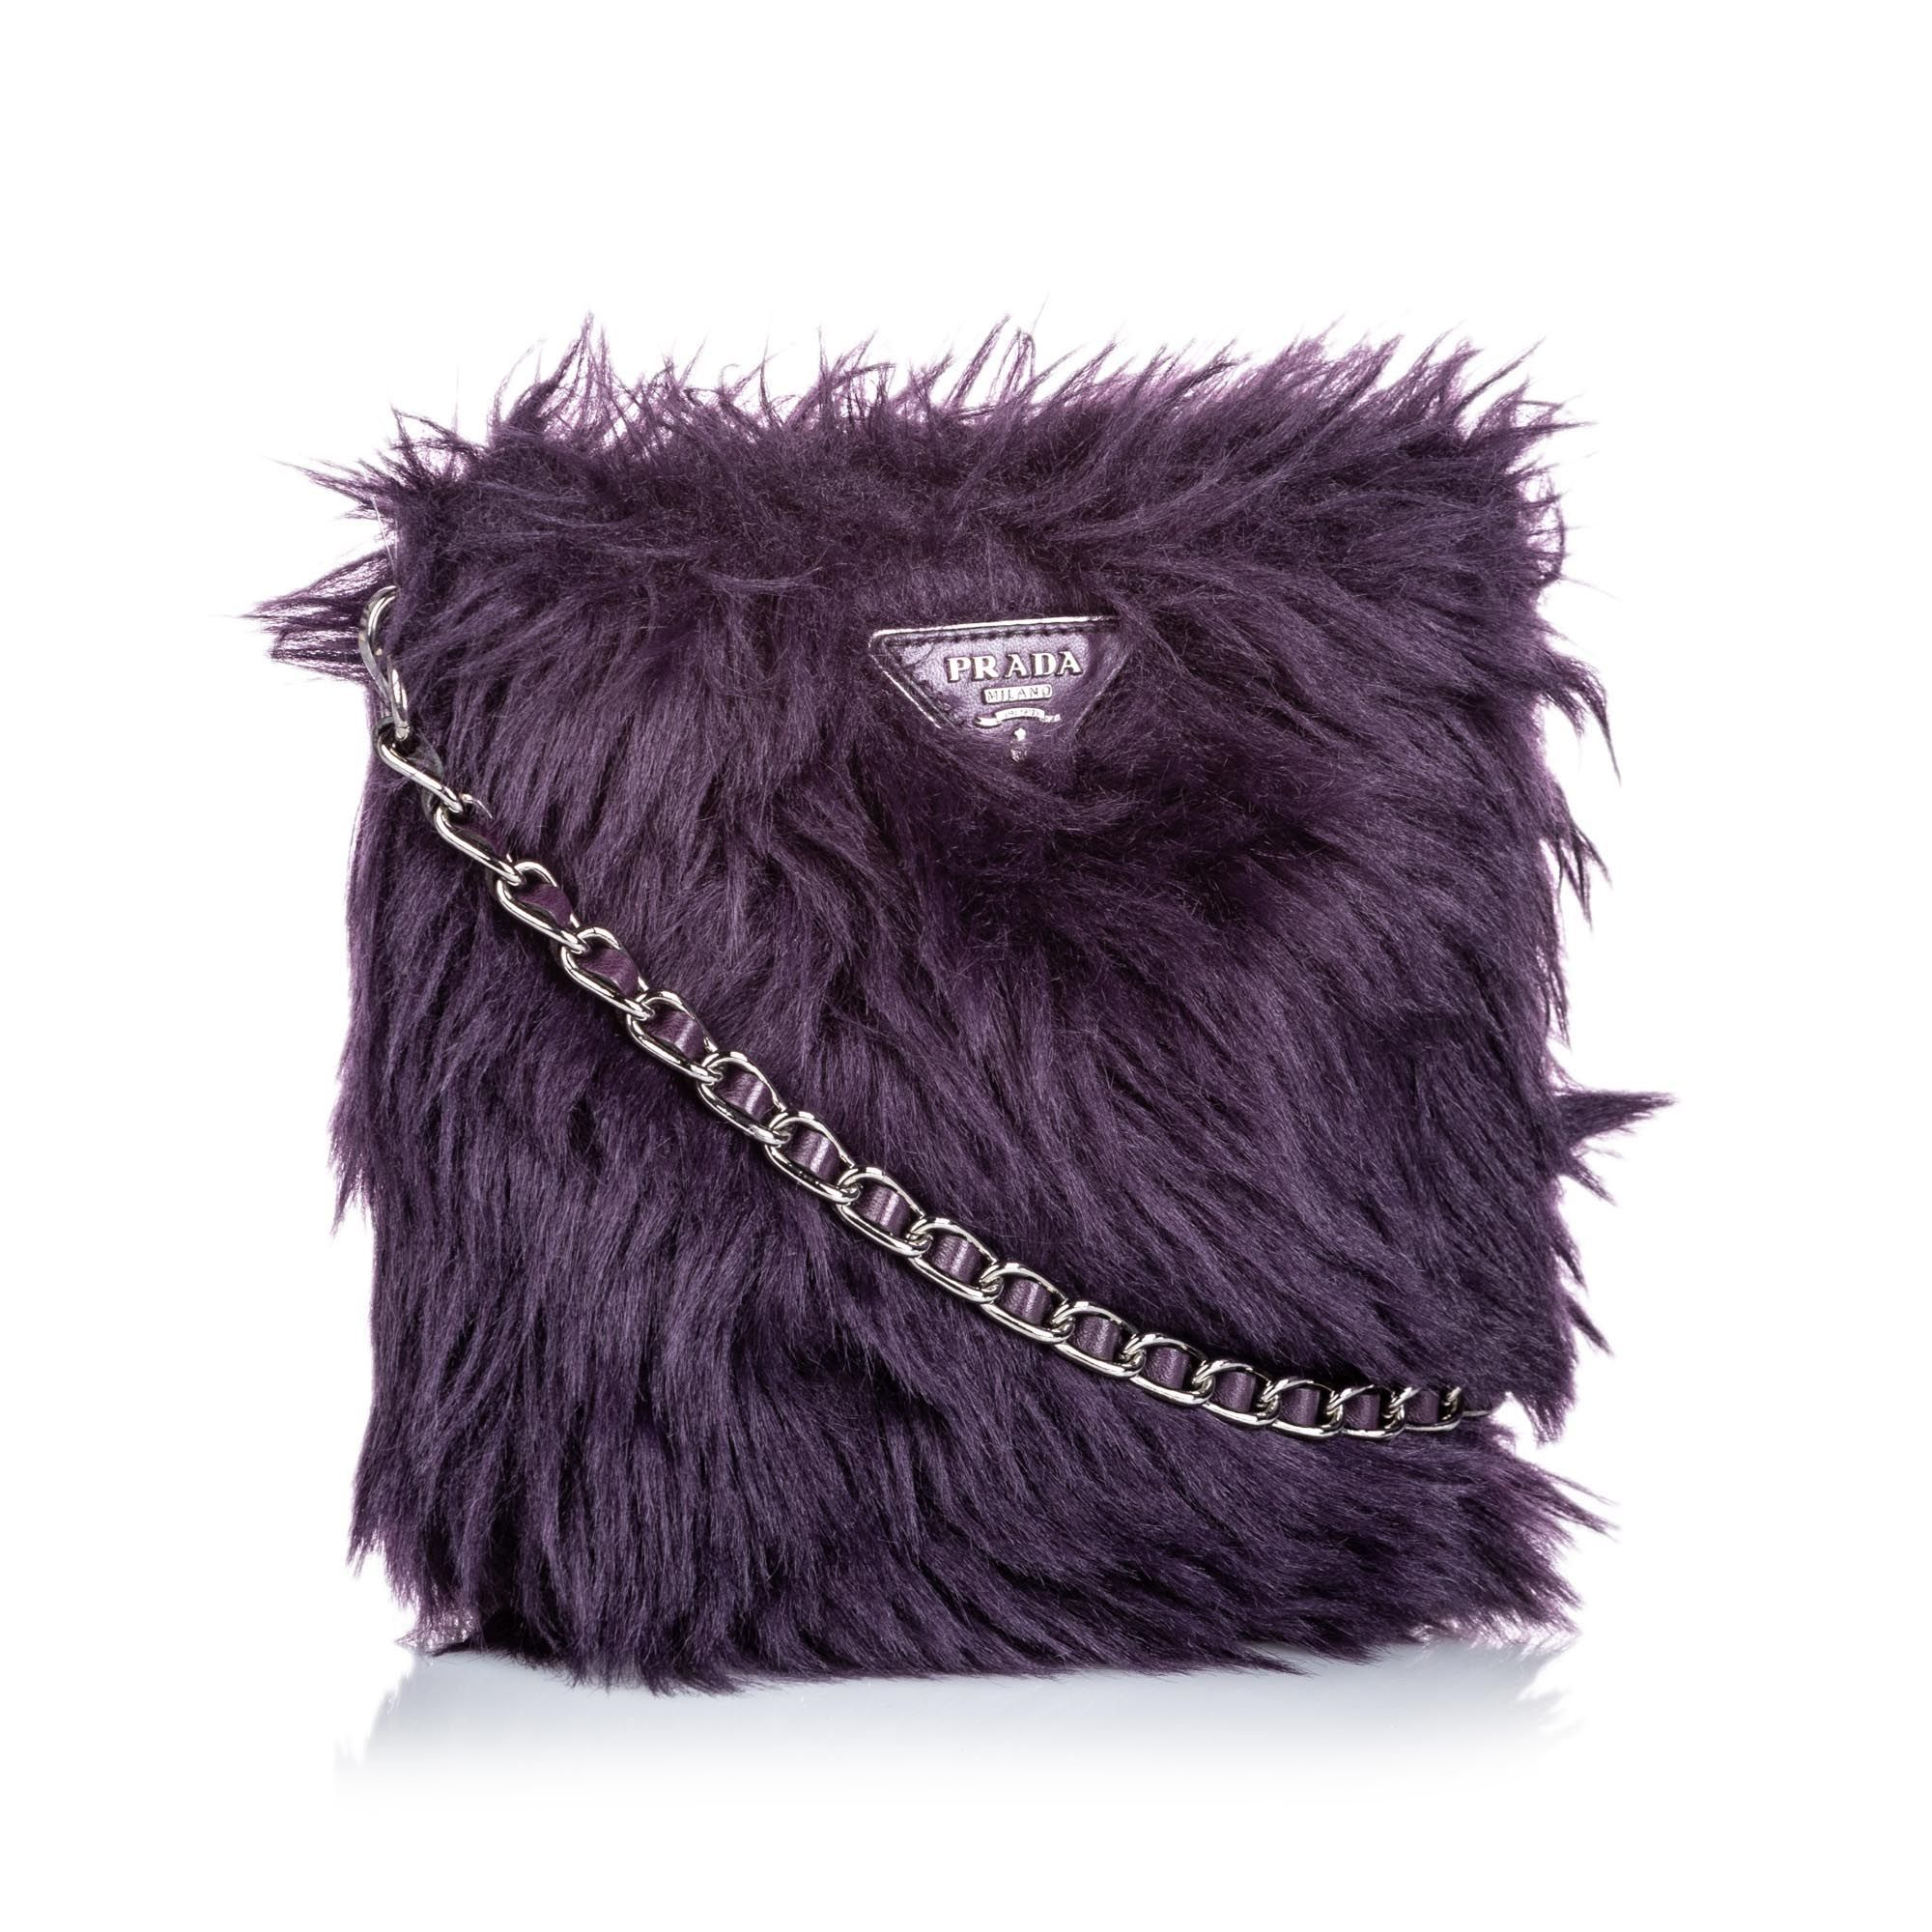 Vintage Prada Fur Crossbody Bag Purple